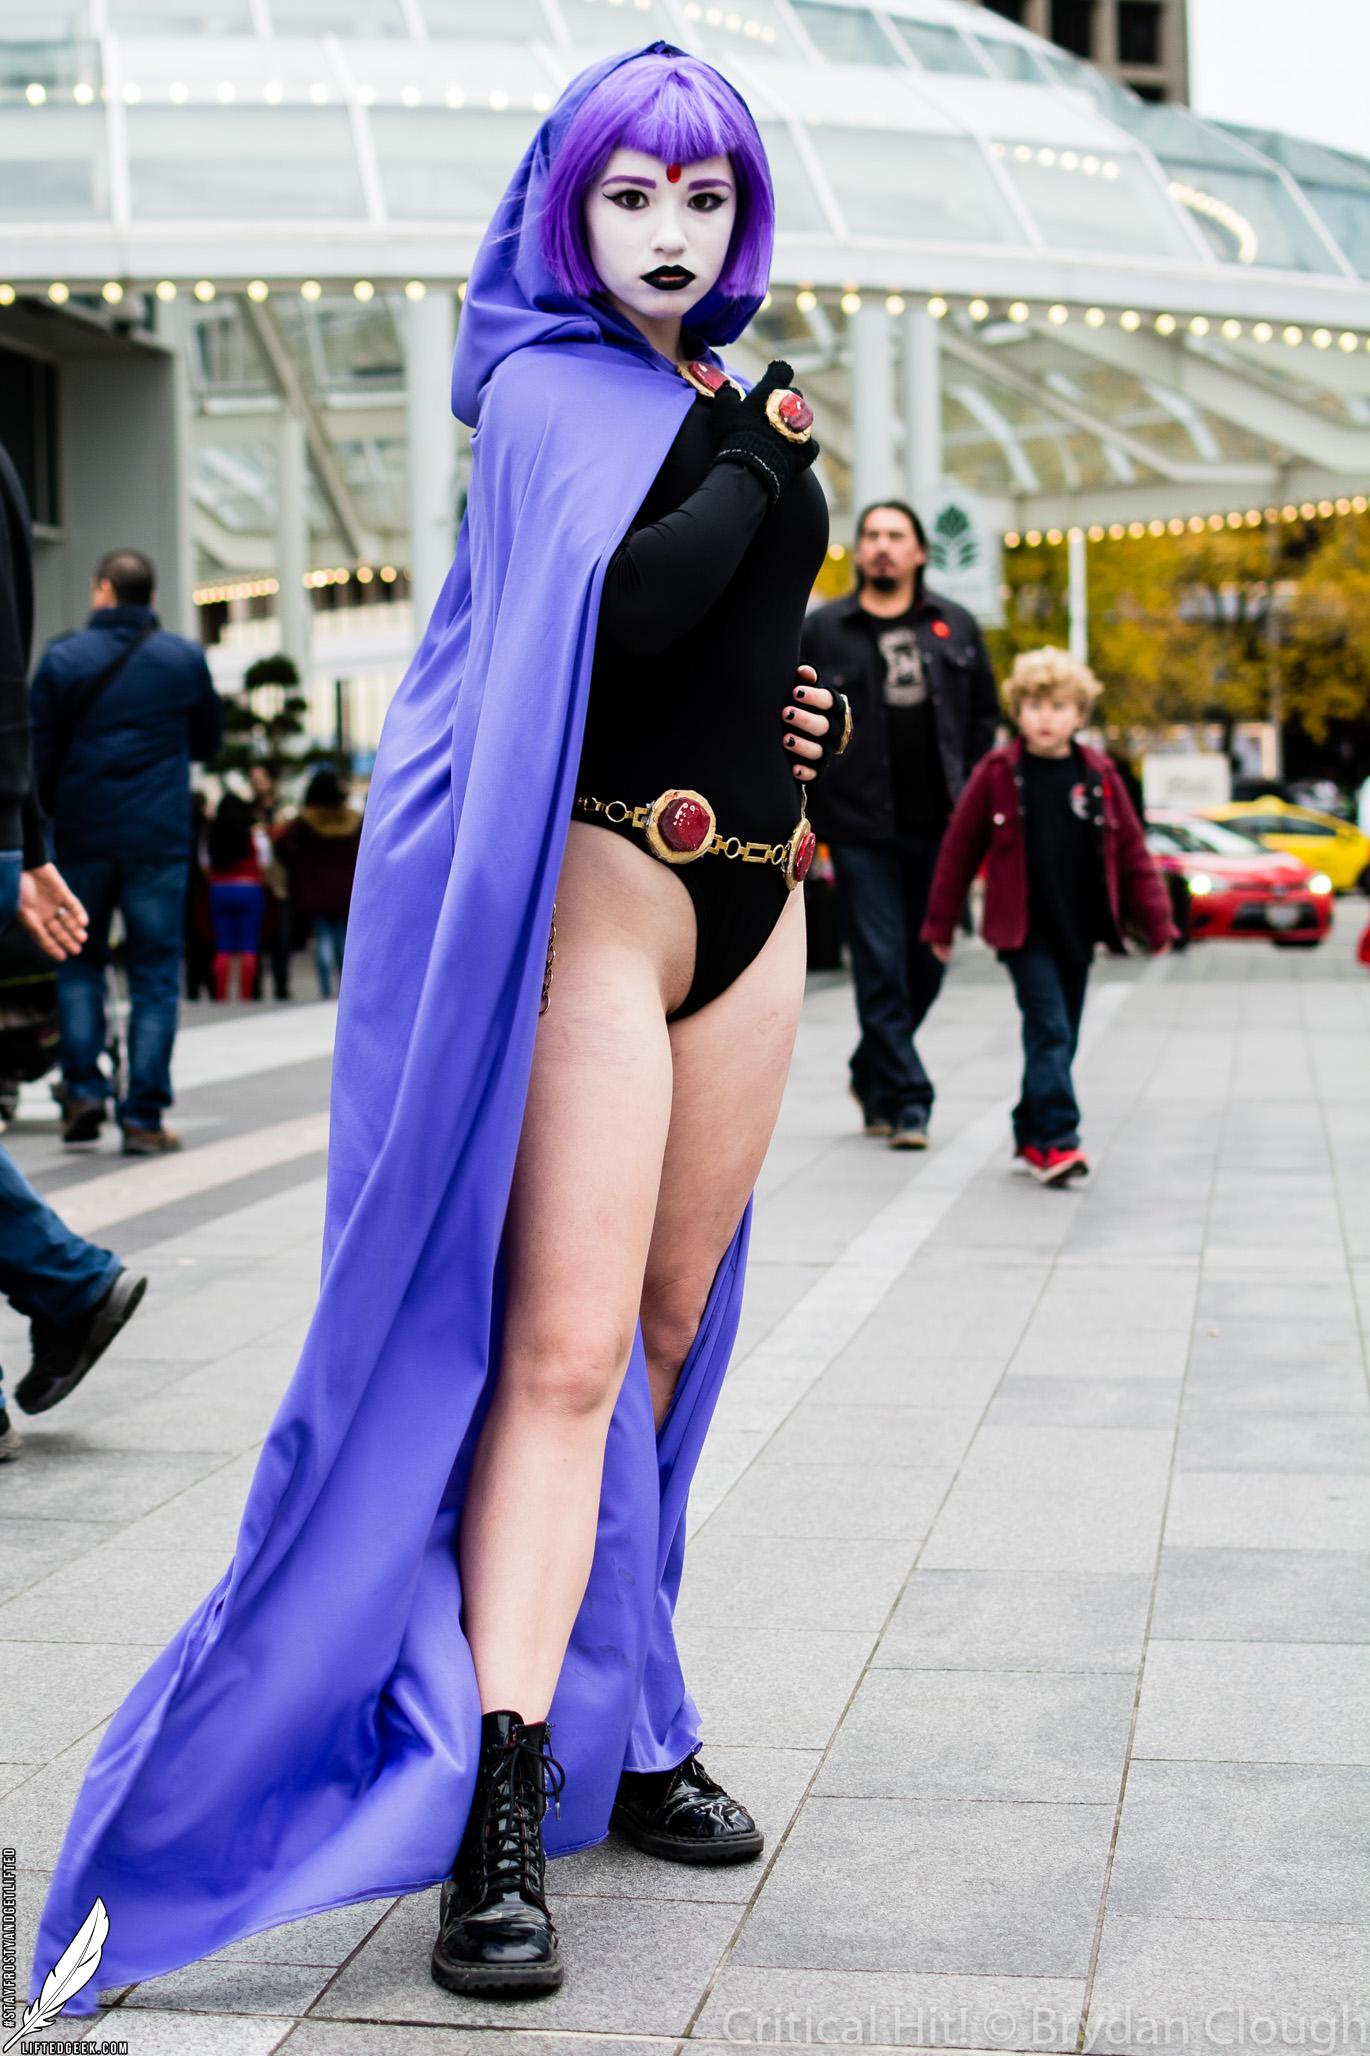 halloween expo cosplay contest 2016-10.jpg